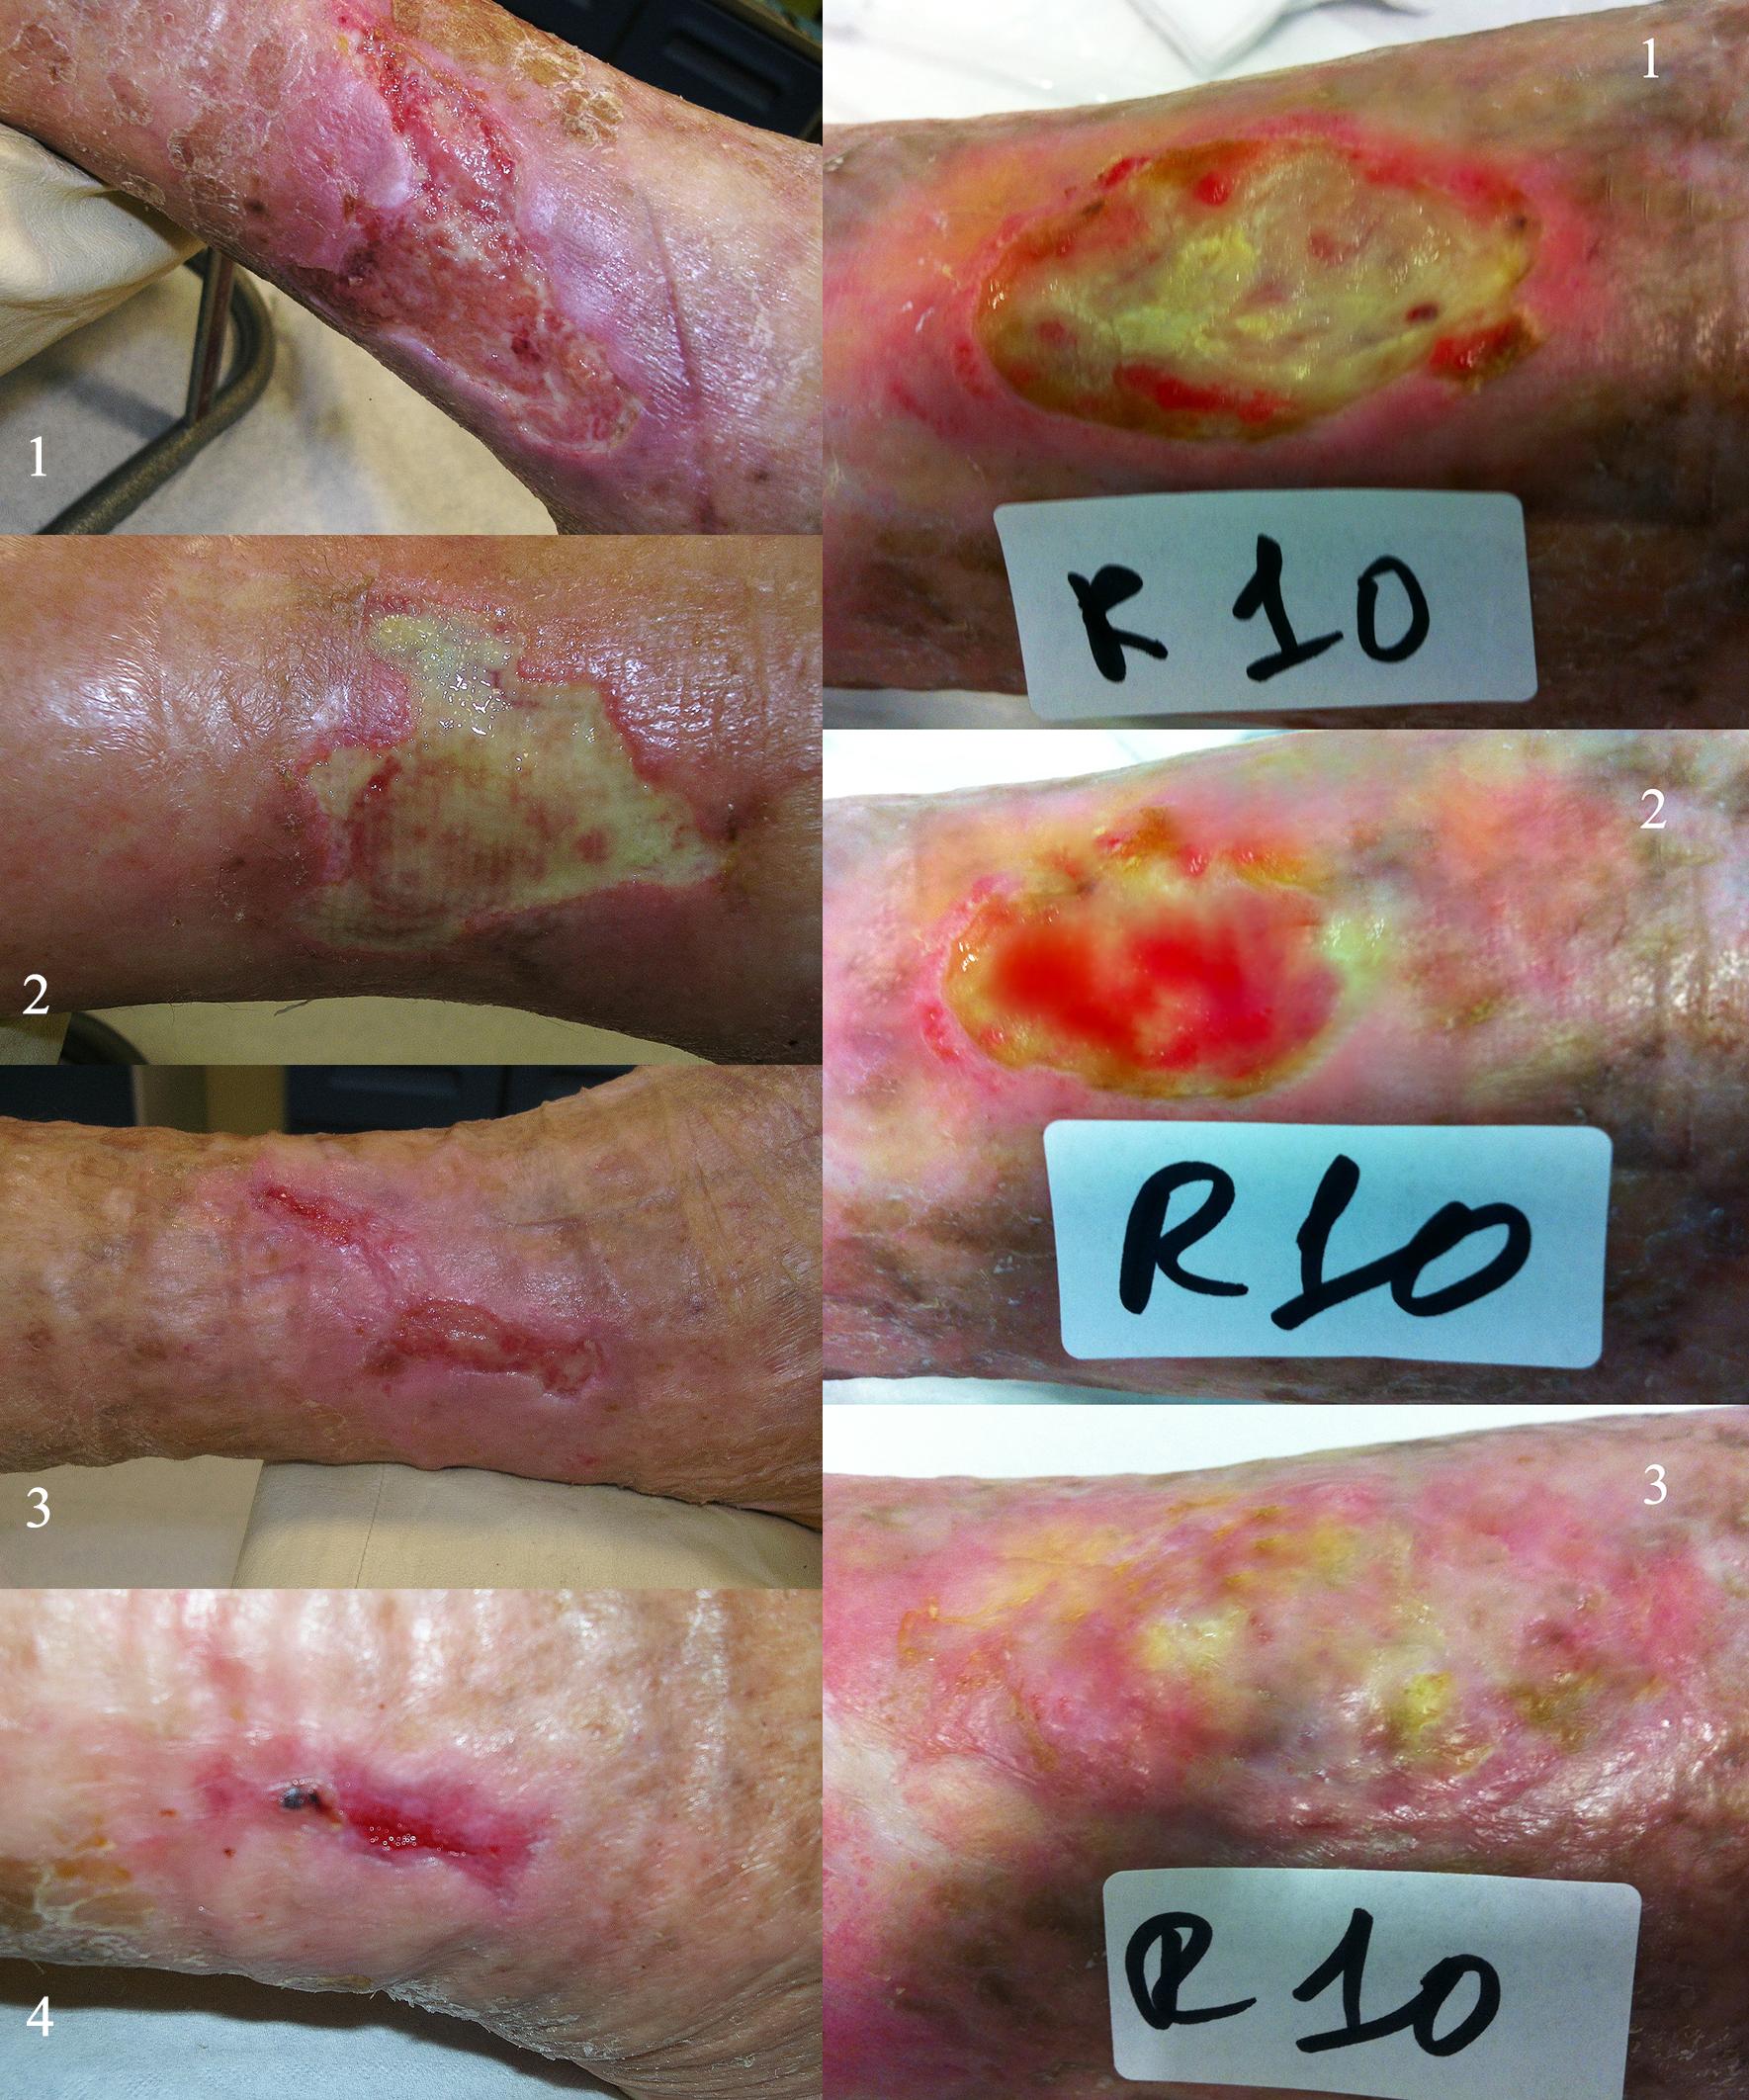 Ulcere Rinovacell